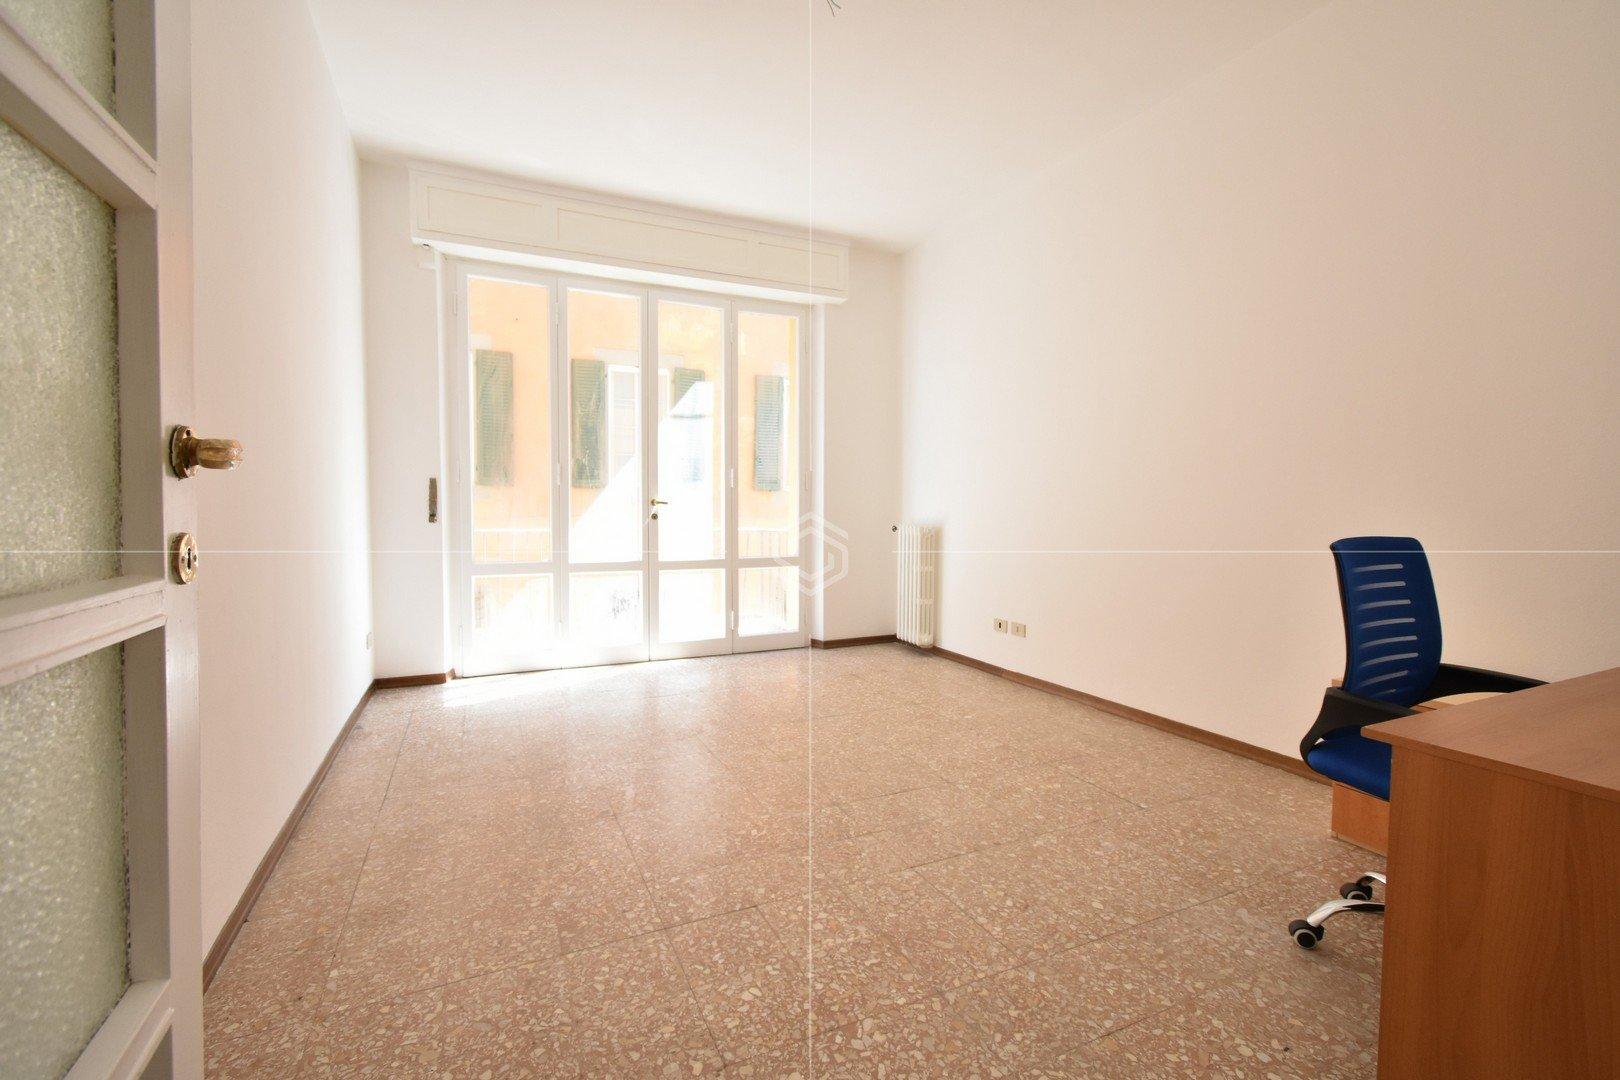 Appartamento in affitto Quartiere Sant'Antonio, Pisa